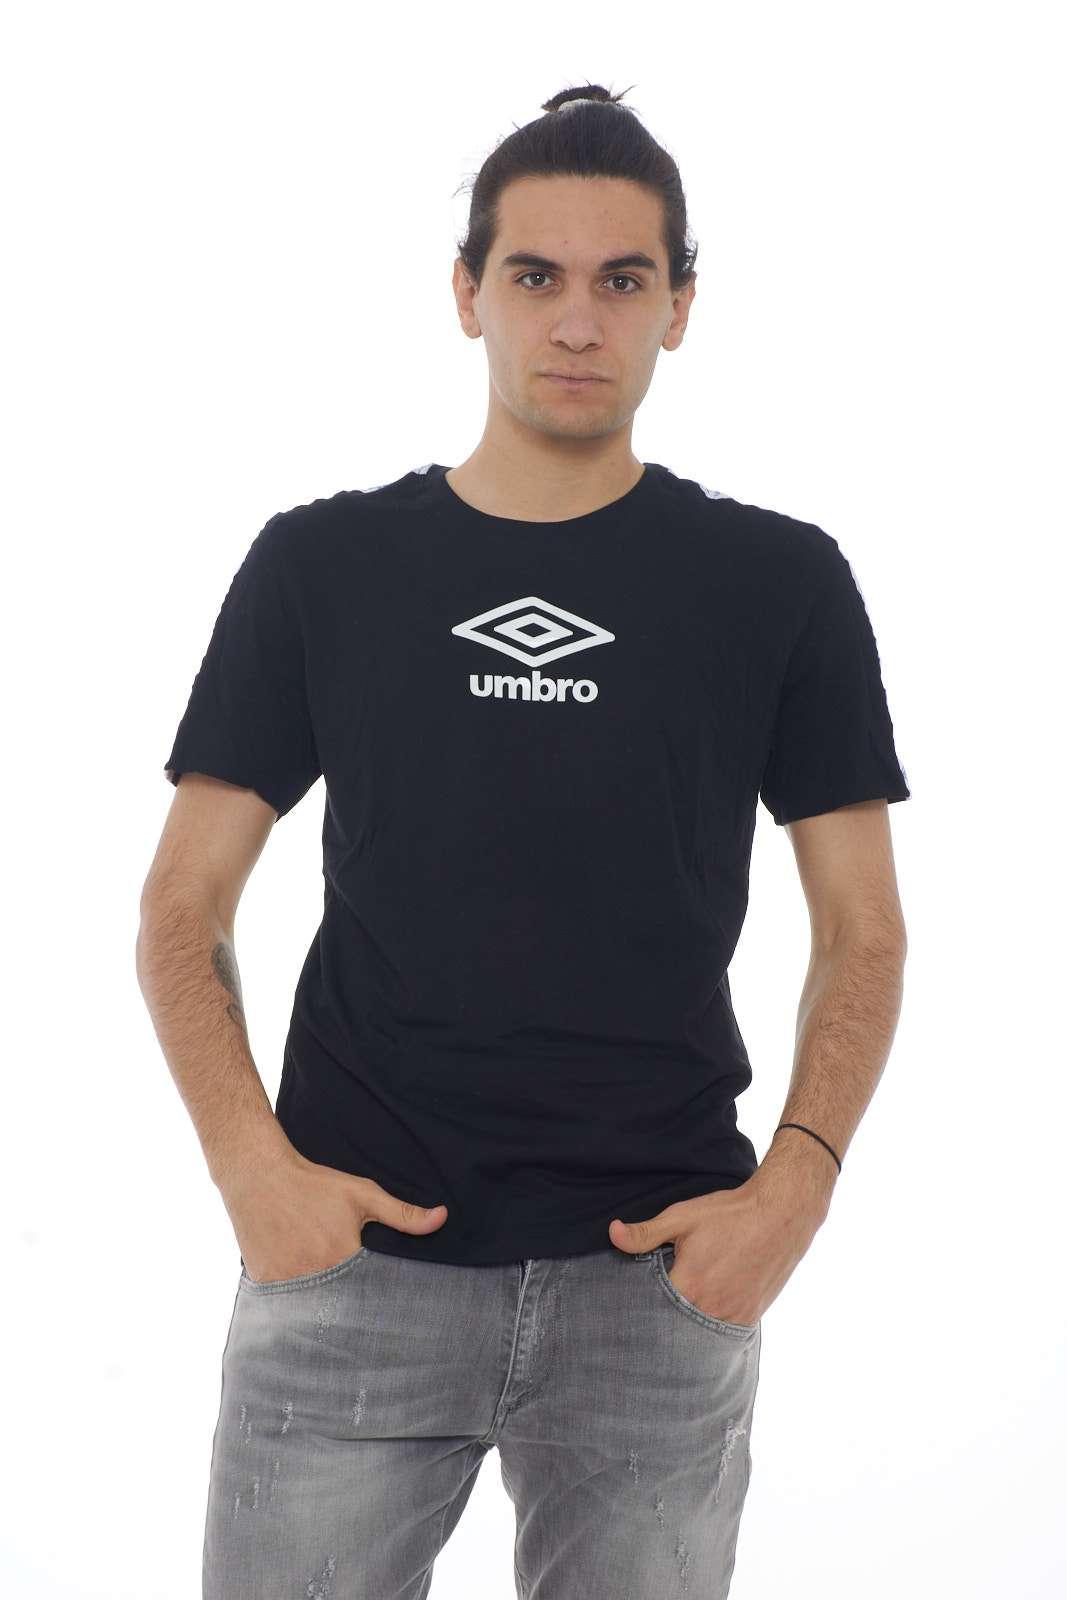 https://www.parmax.com/media/catalog/product/a/i/PE-outlet_parmax-t-shirt-uomo-Umbro-19ETPU0170-A.jpg